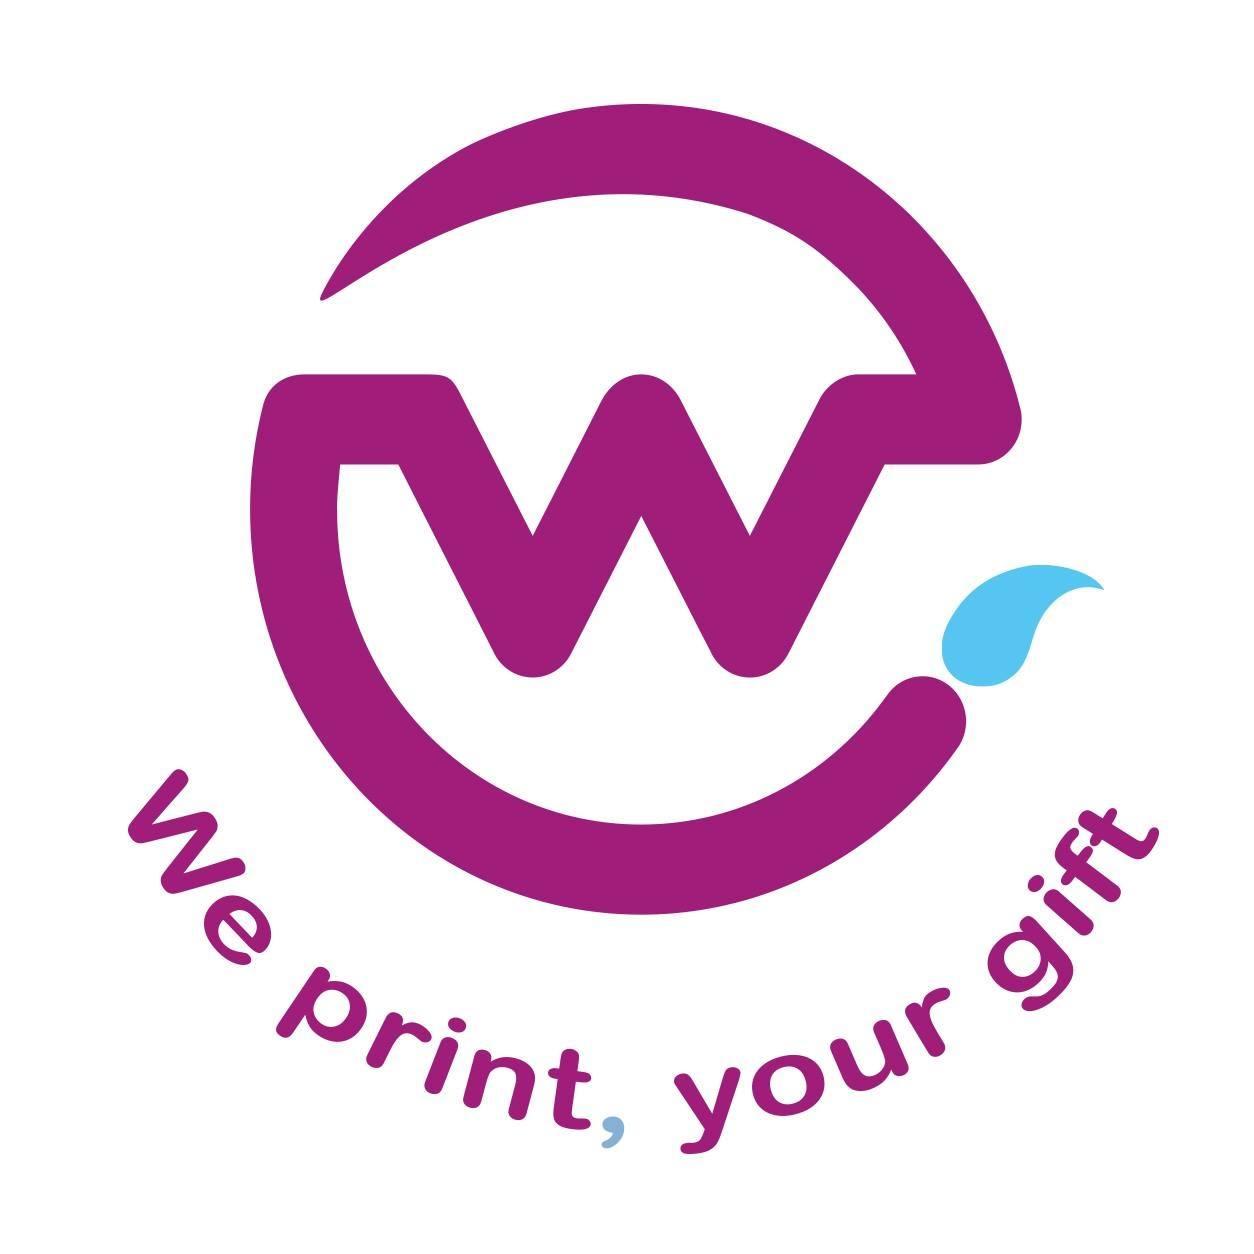 وي برينت WE Print